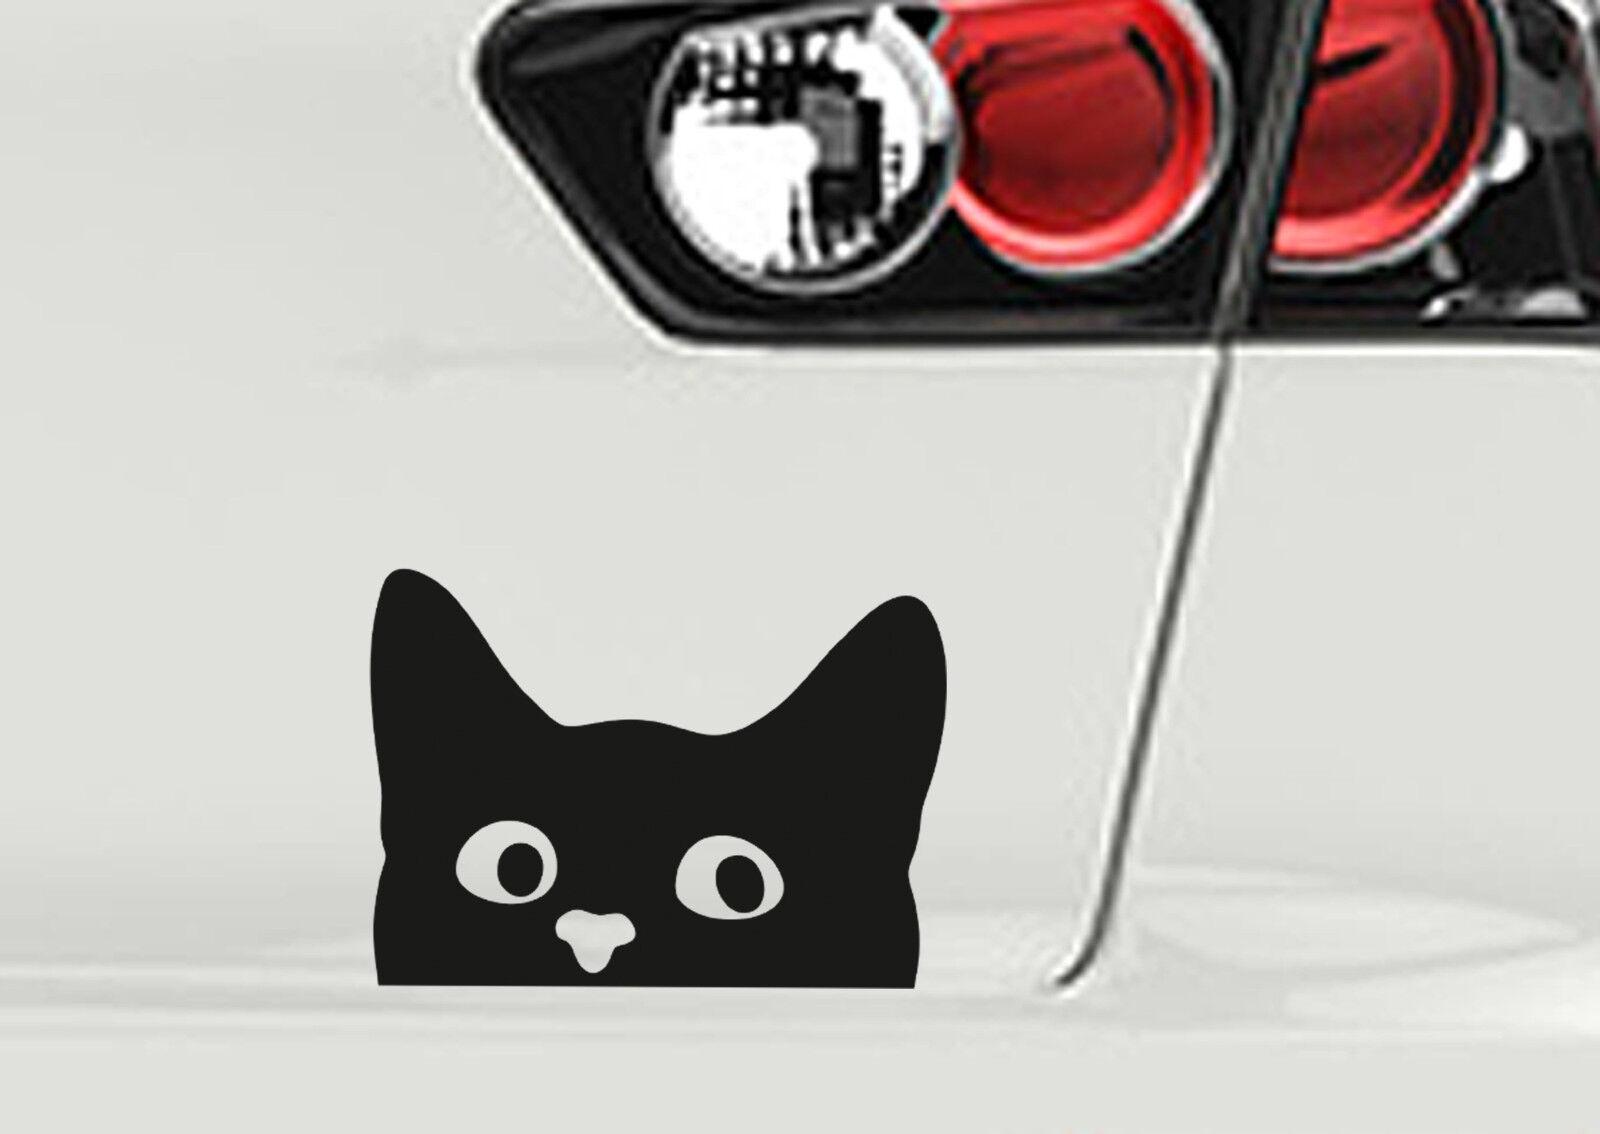 Katze cat Aufkleber Autoaufkleber Sticker Autotattoo Farbauswahl Folie ORACAL651